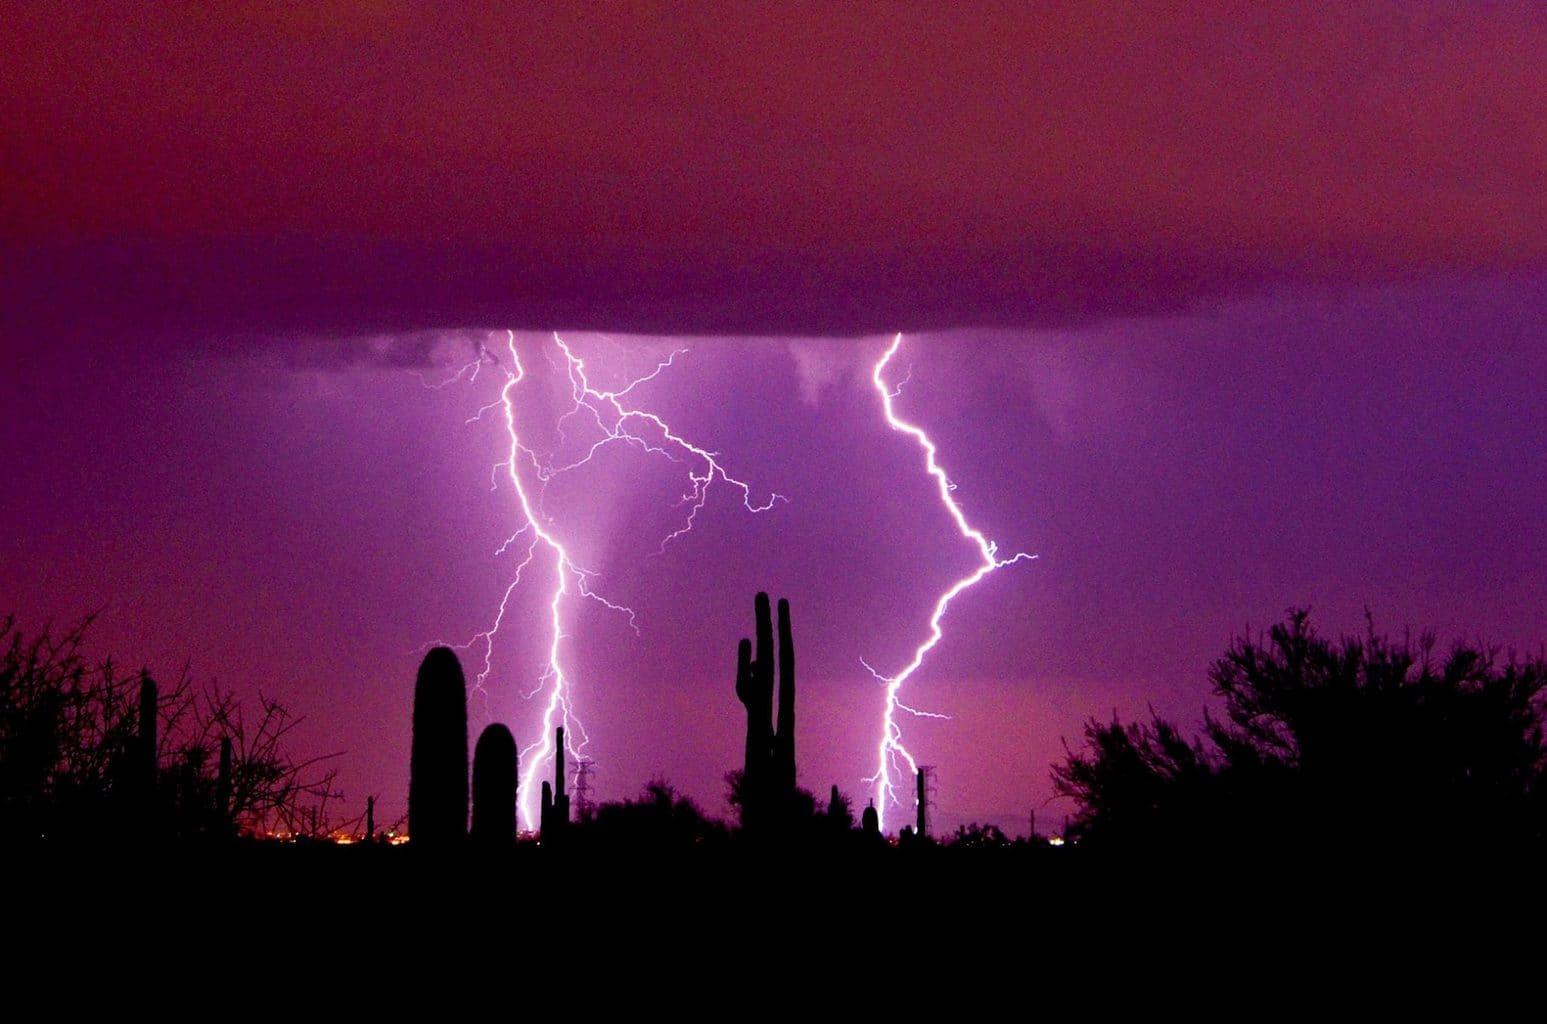 Twin bolts. Mesa AZ.